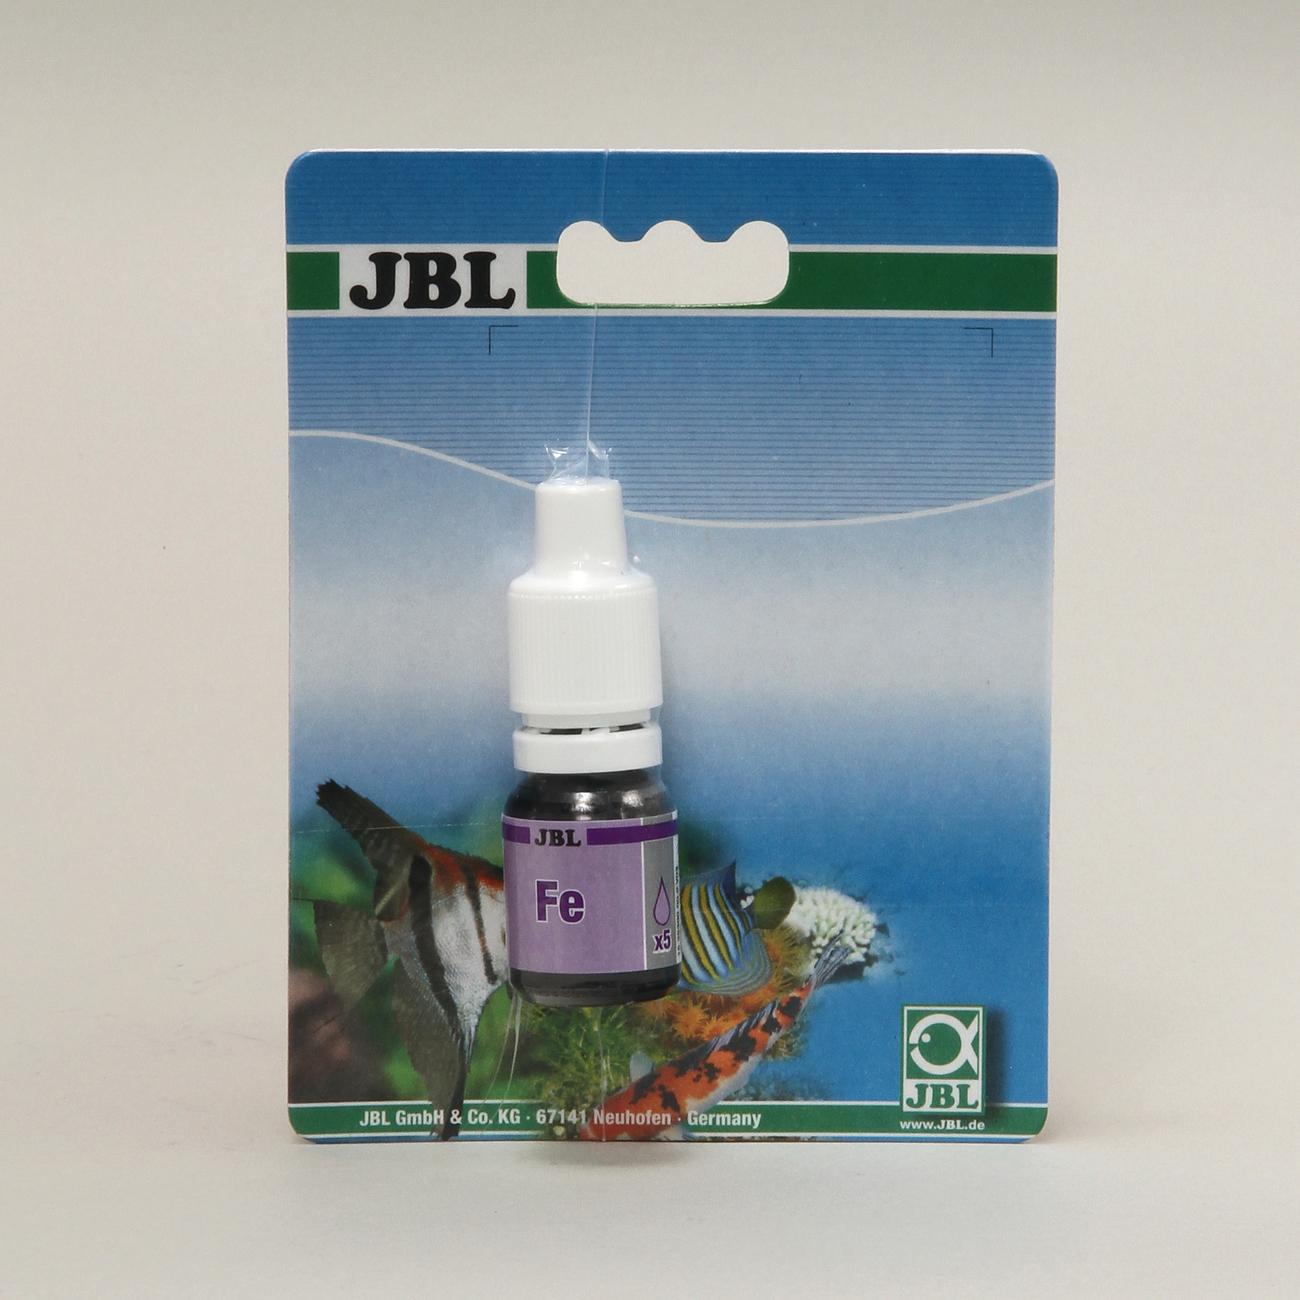 JBL Fe Eisen Test, Nachfüllpack